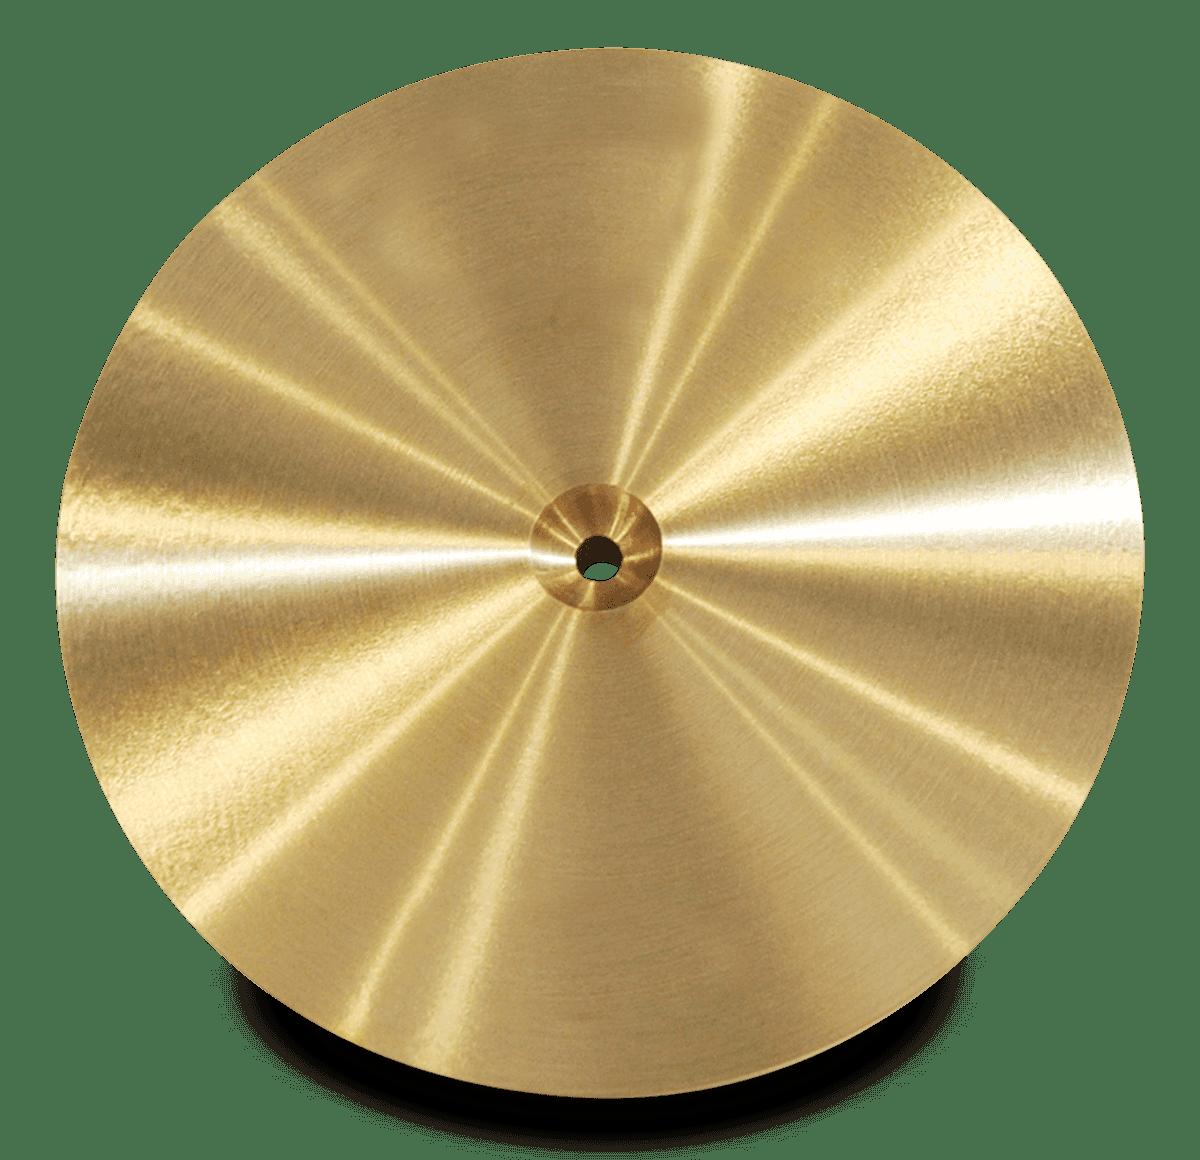 Zildjian CYMBALES D'ORCHESTRE P0622A